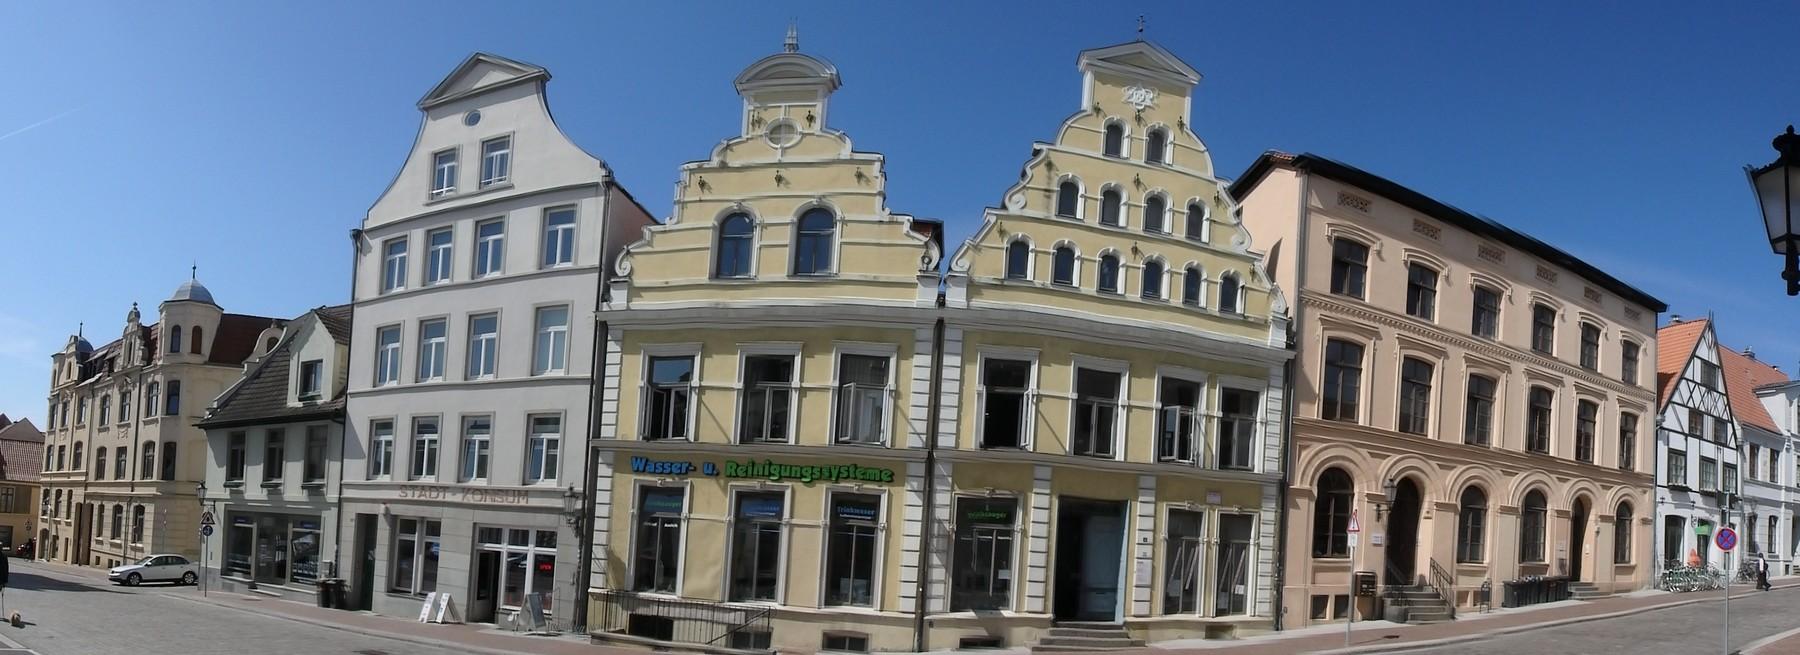 P4290268 Pano Casco historico Wismar Unesco Alemania